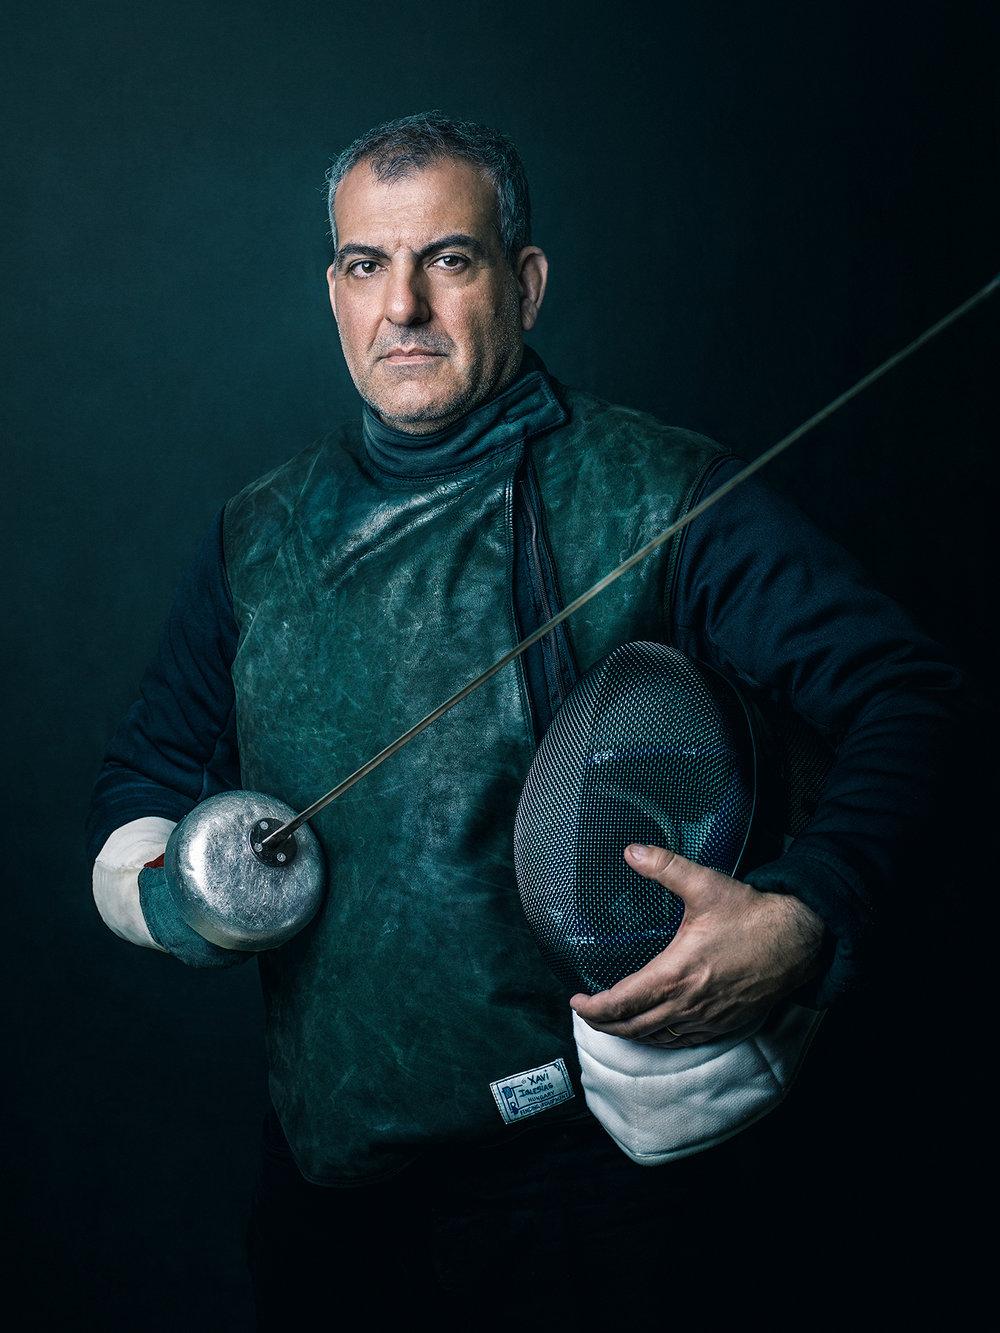 Oscar-arribas-esgrima-maestro-fencing-master-fencer-fechten-scherma-escrime-portrait-fotografo-retrato-photographer017.jpg